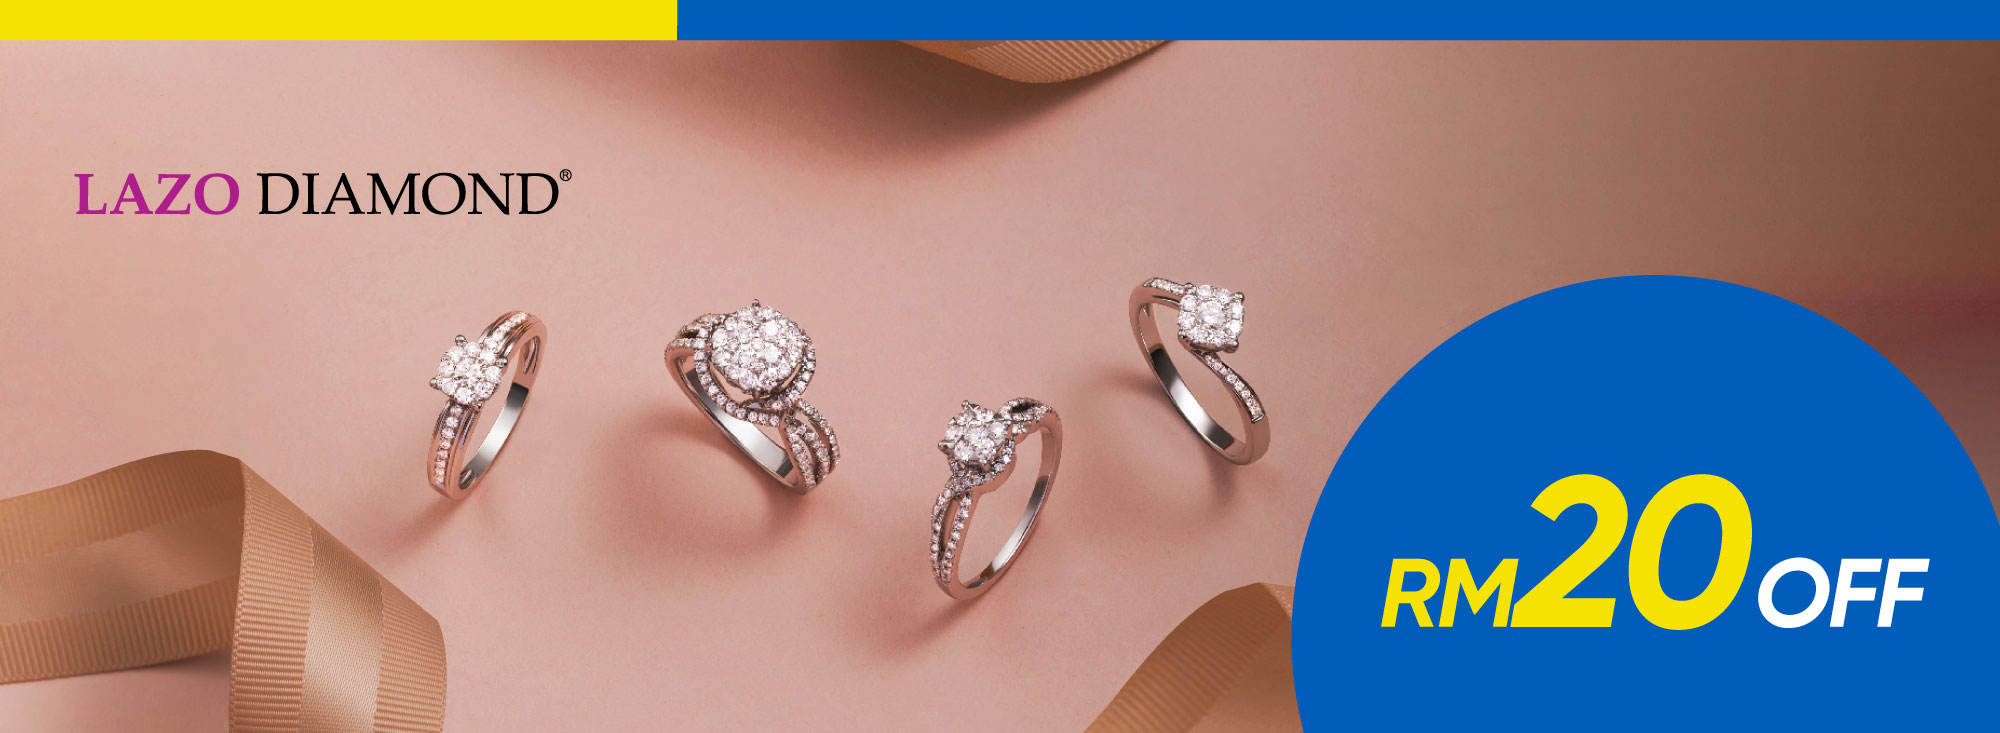 Lazo Diamond up to RM600 Discount Promo